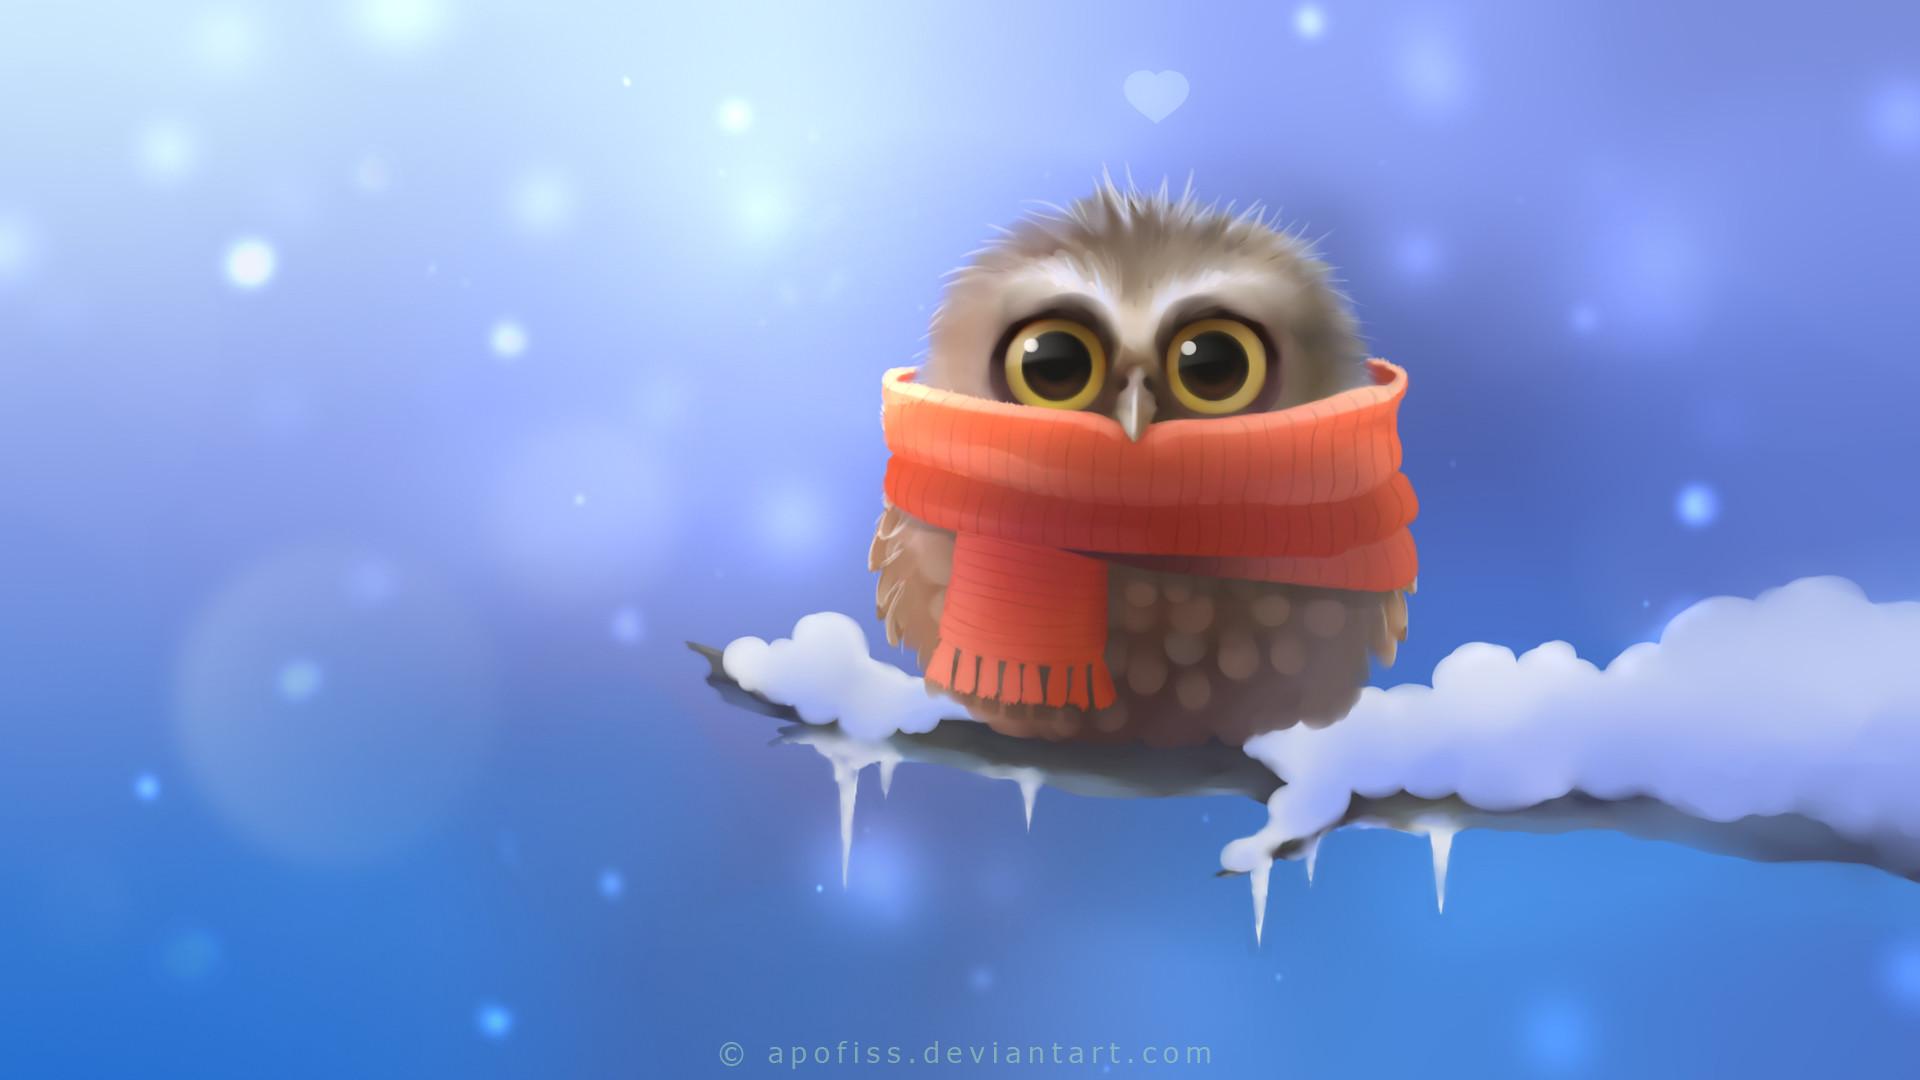 Animated Cheetah Wallpaper owl christmas wallpaper (53+ images)